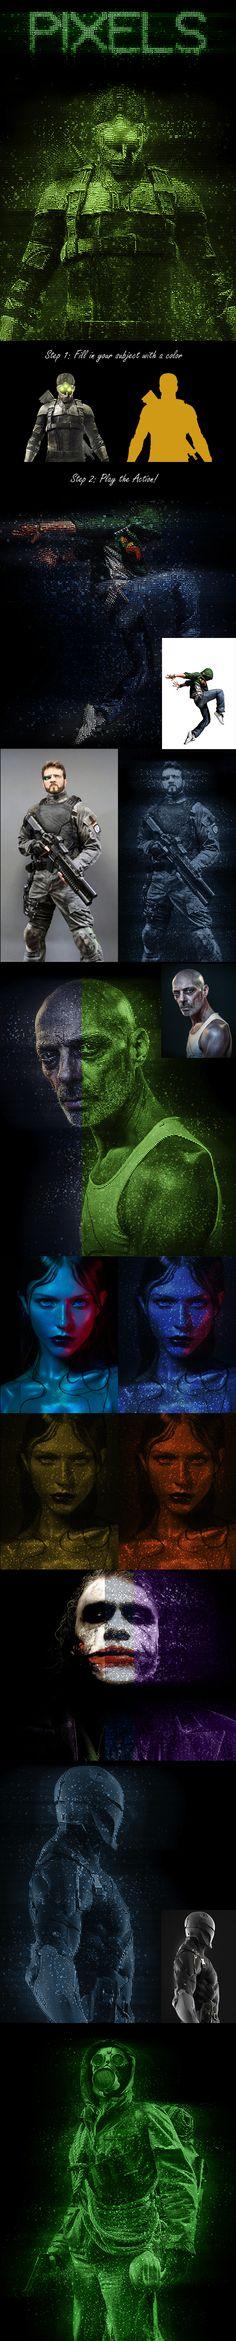 Pixels Photoshop Action - Photo Effects Actions